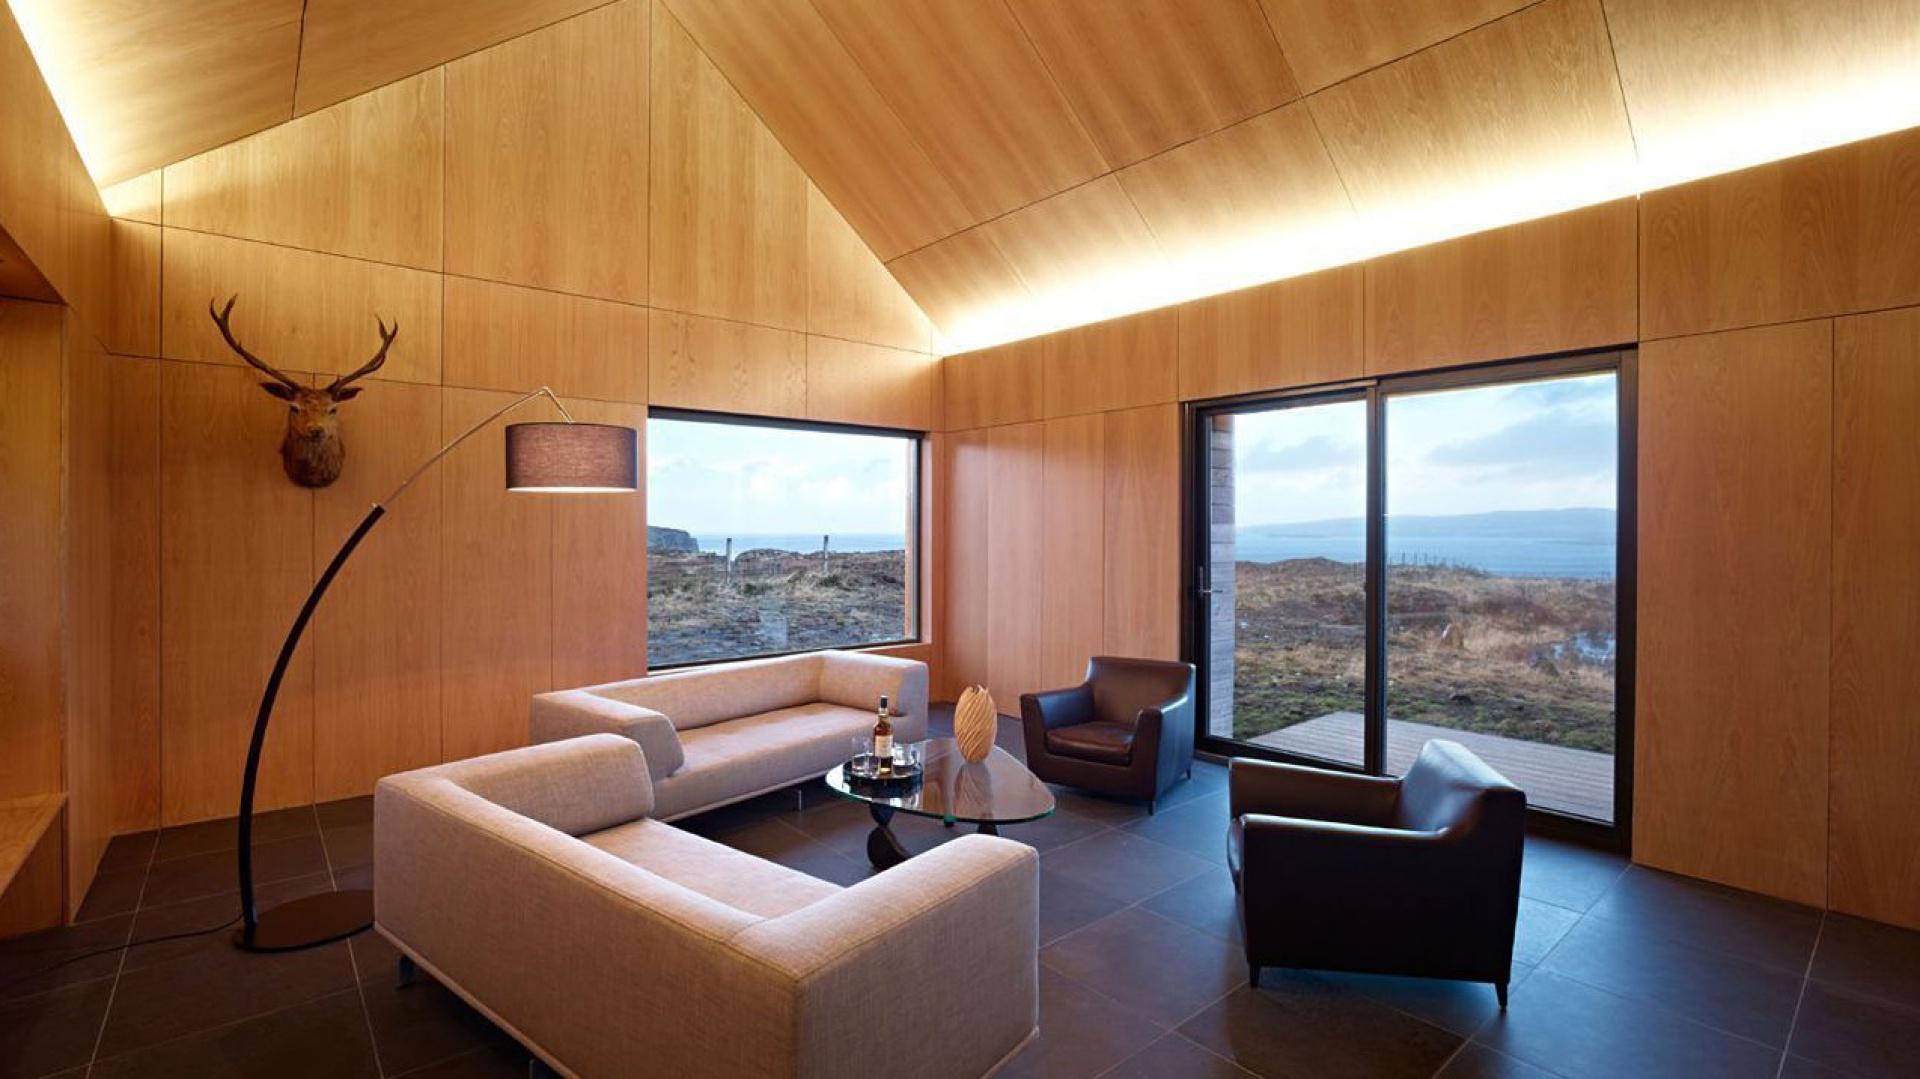 borreraig-house-dualchas architects szkocja (3).jpg